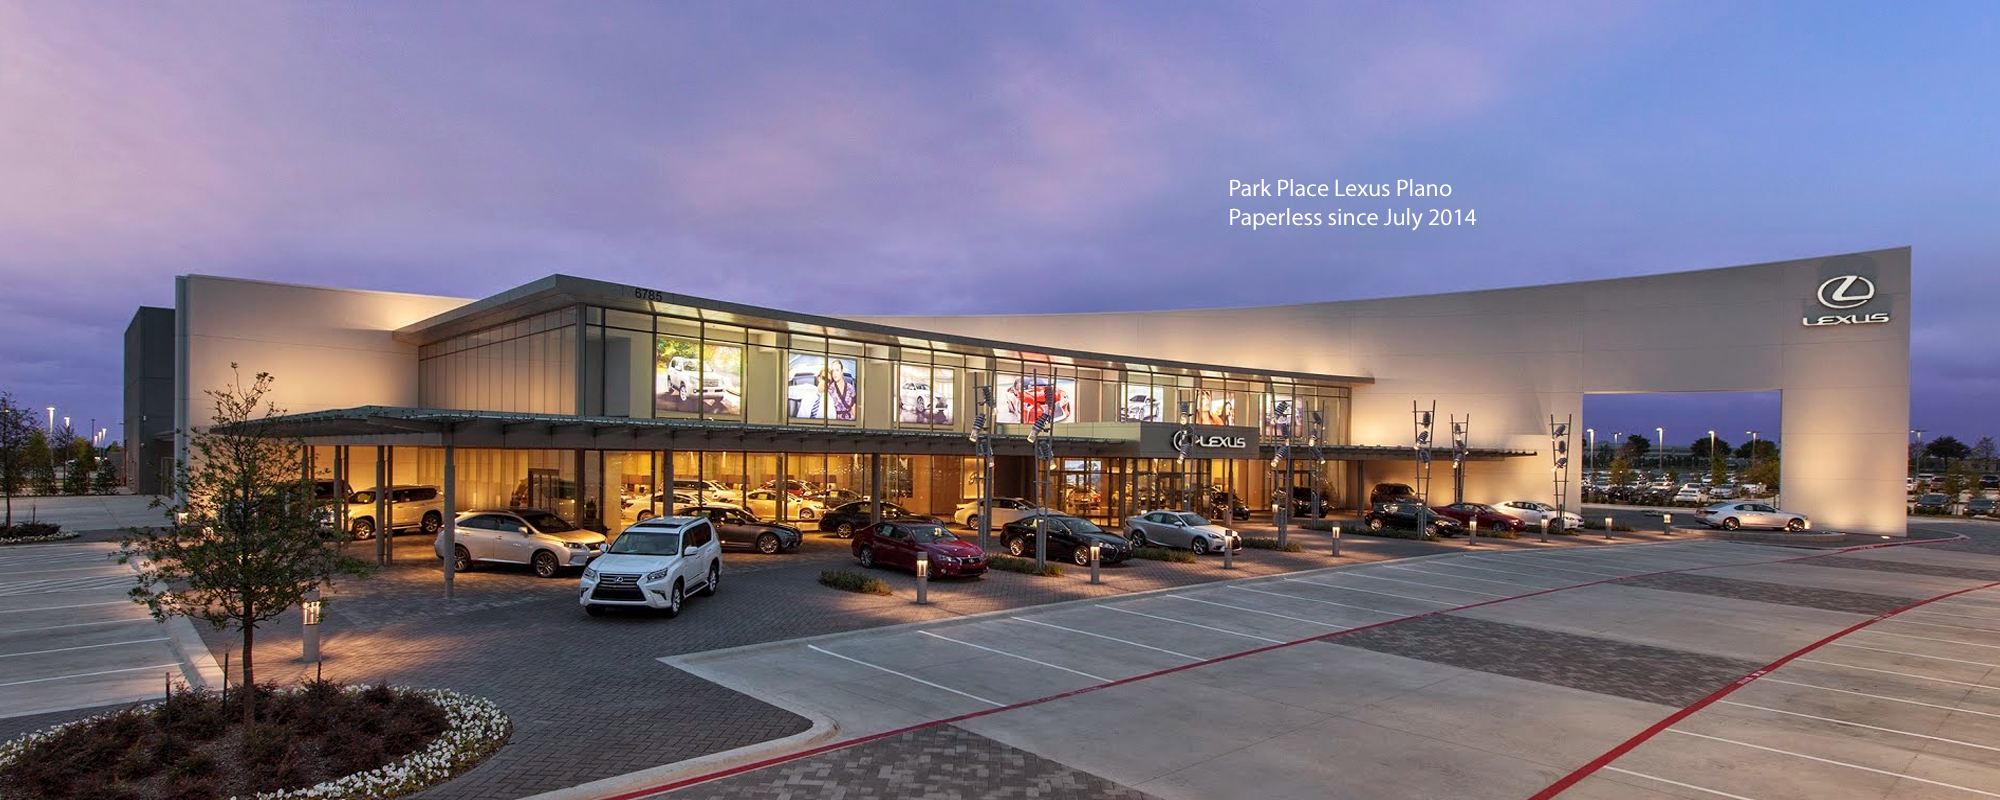 Park Place Lexus Plano.jpg